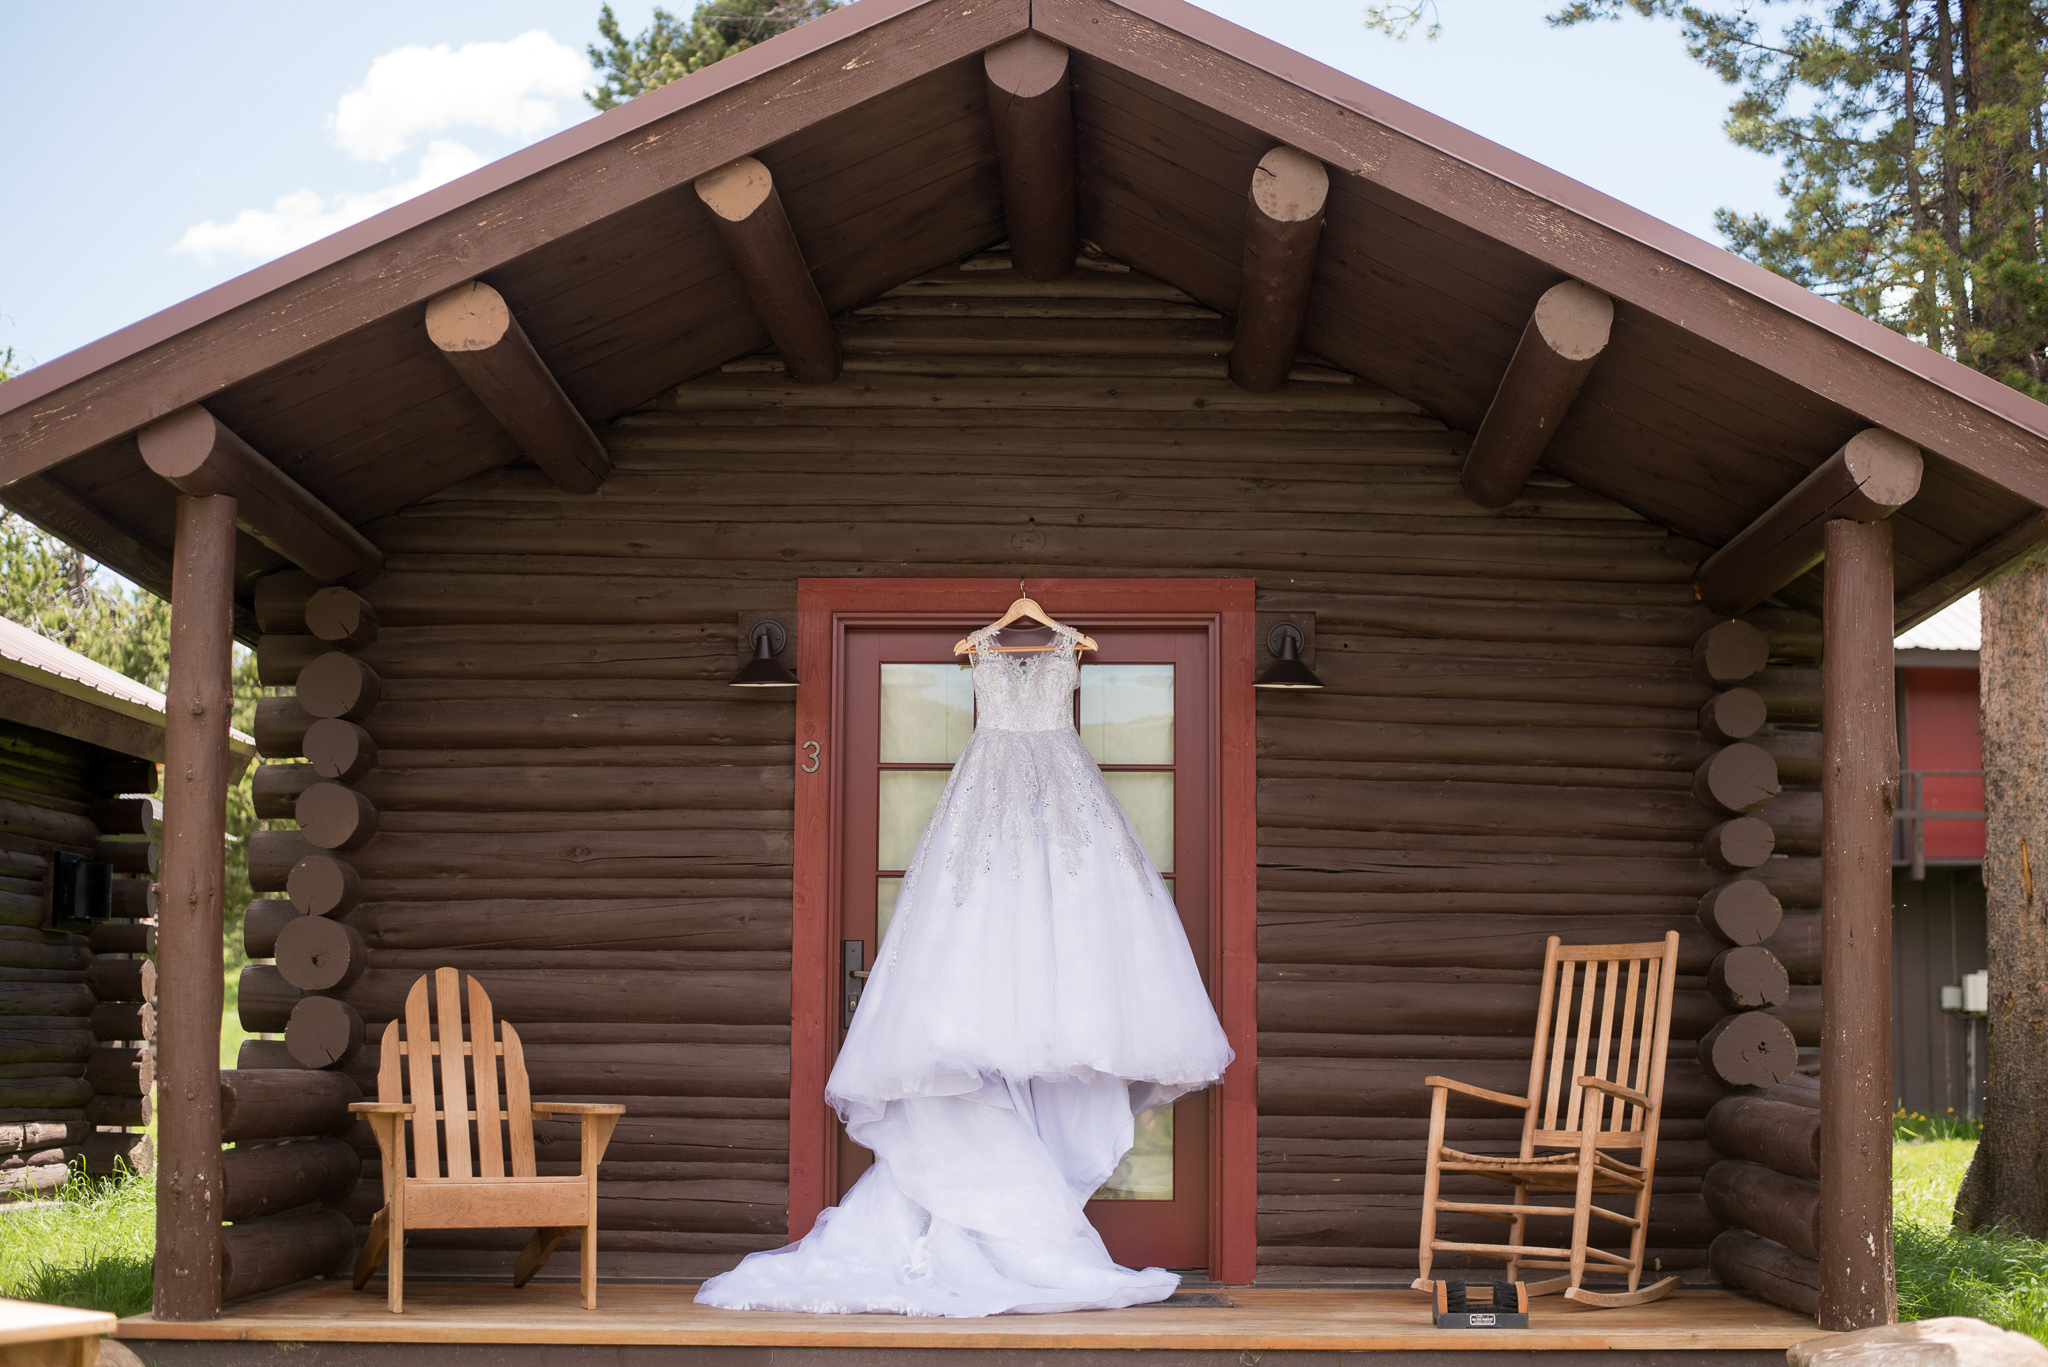 TypeA_WyomingNationalParkWedding_LogCabin_WeddingDressPhoto.jpg